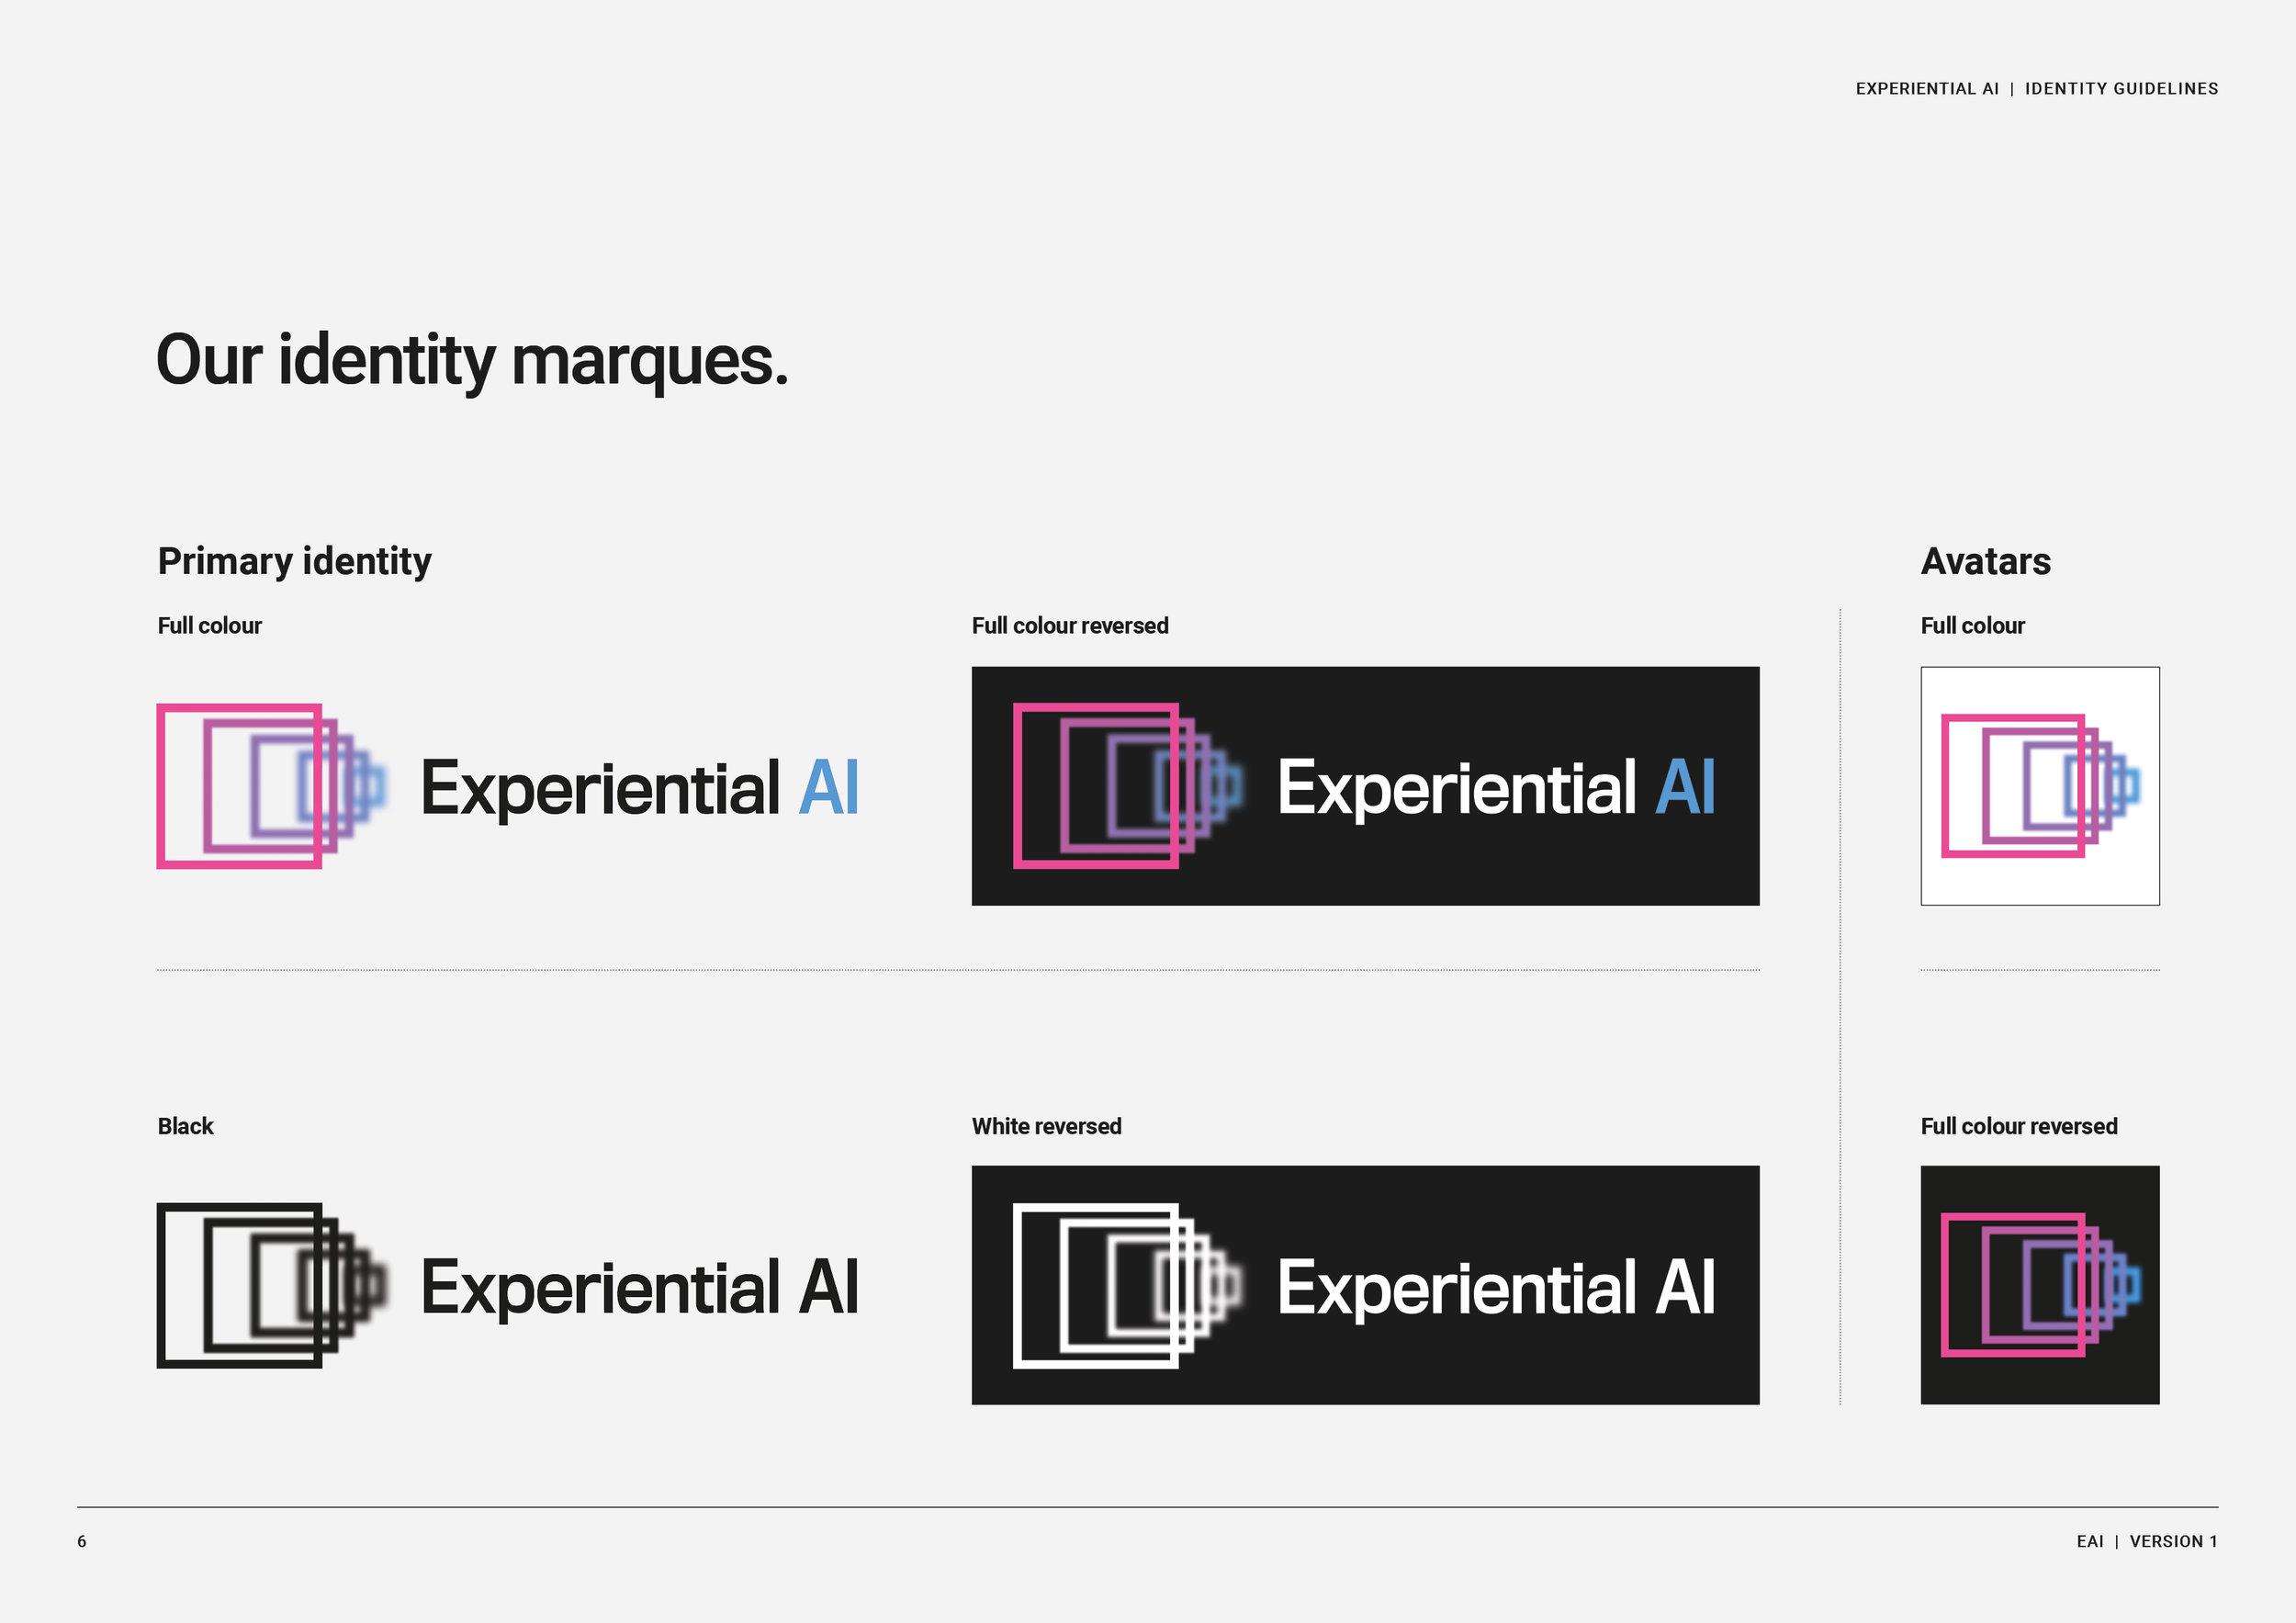 EAI_Identity_Guidelines6.jpg